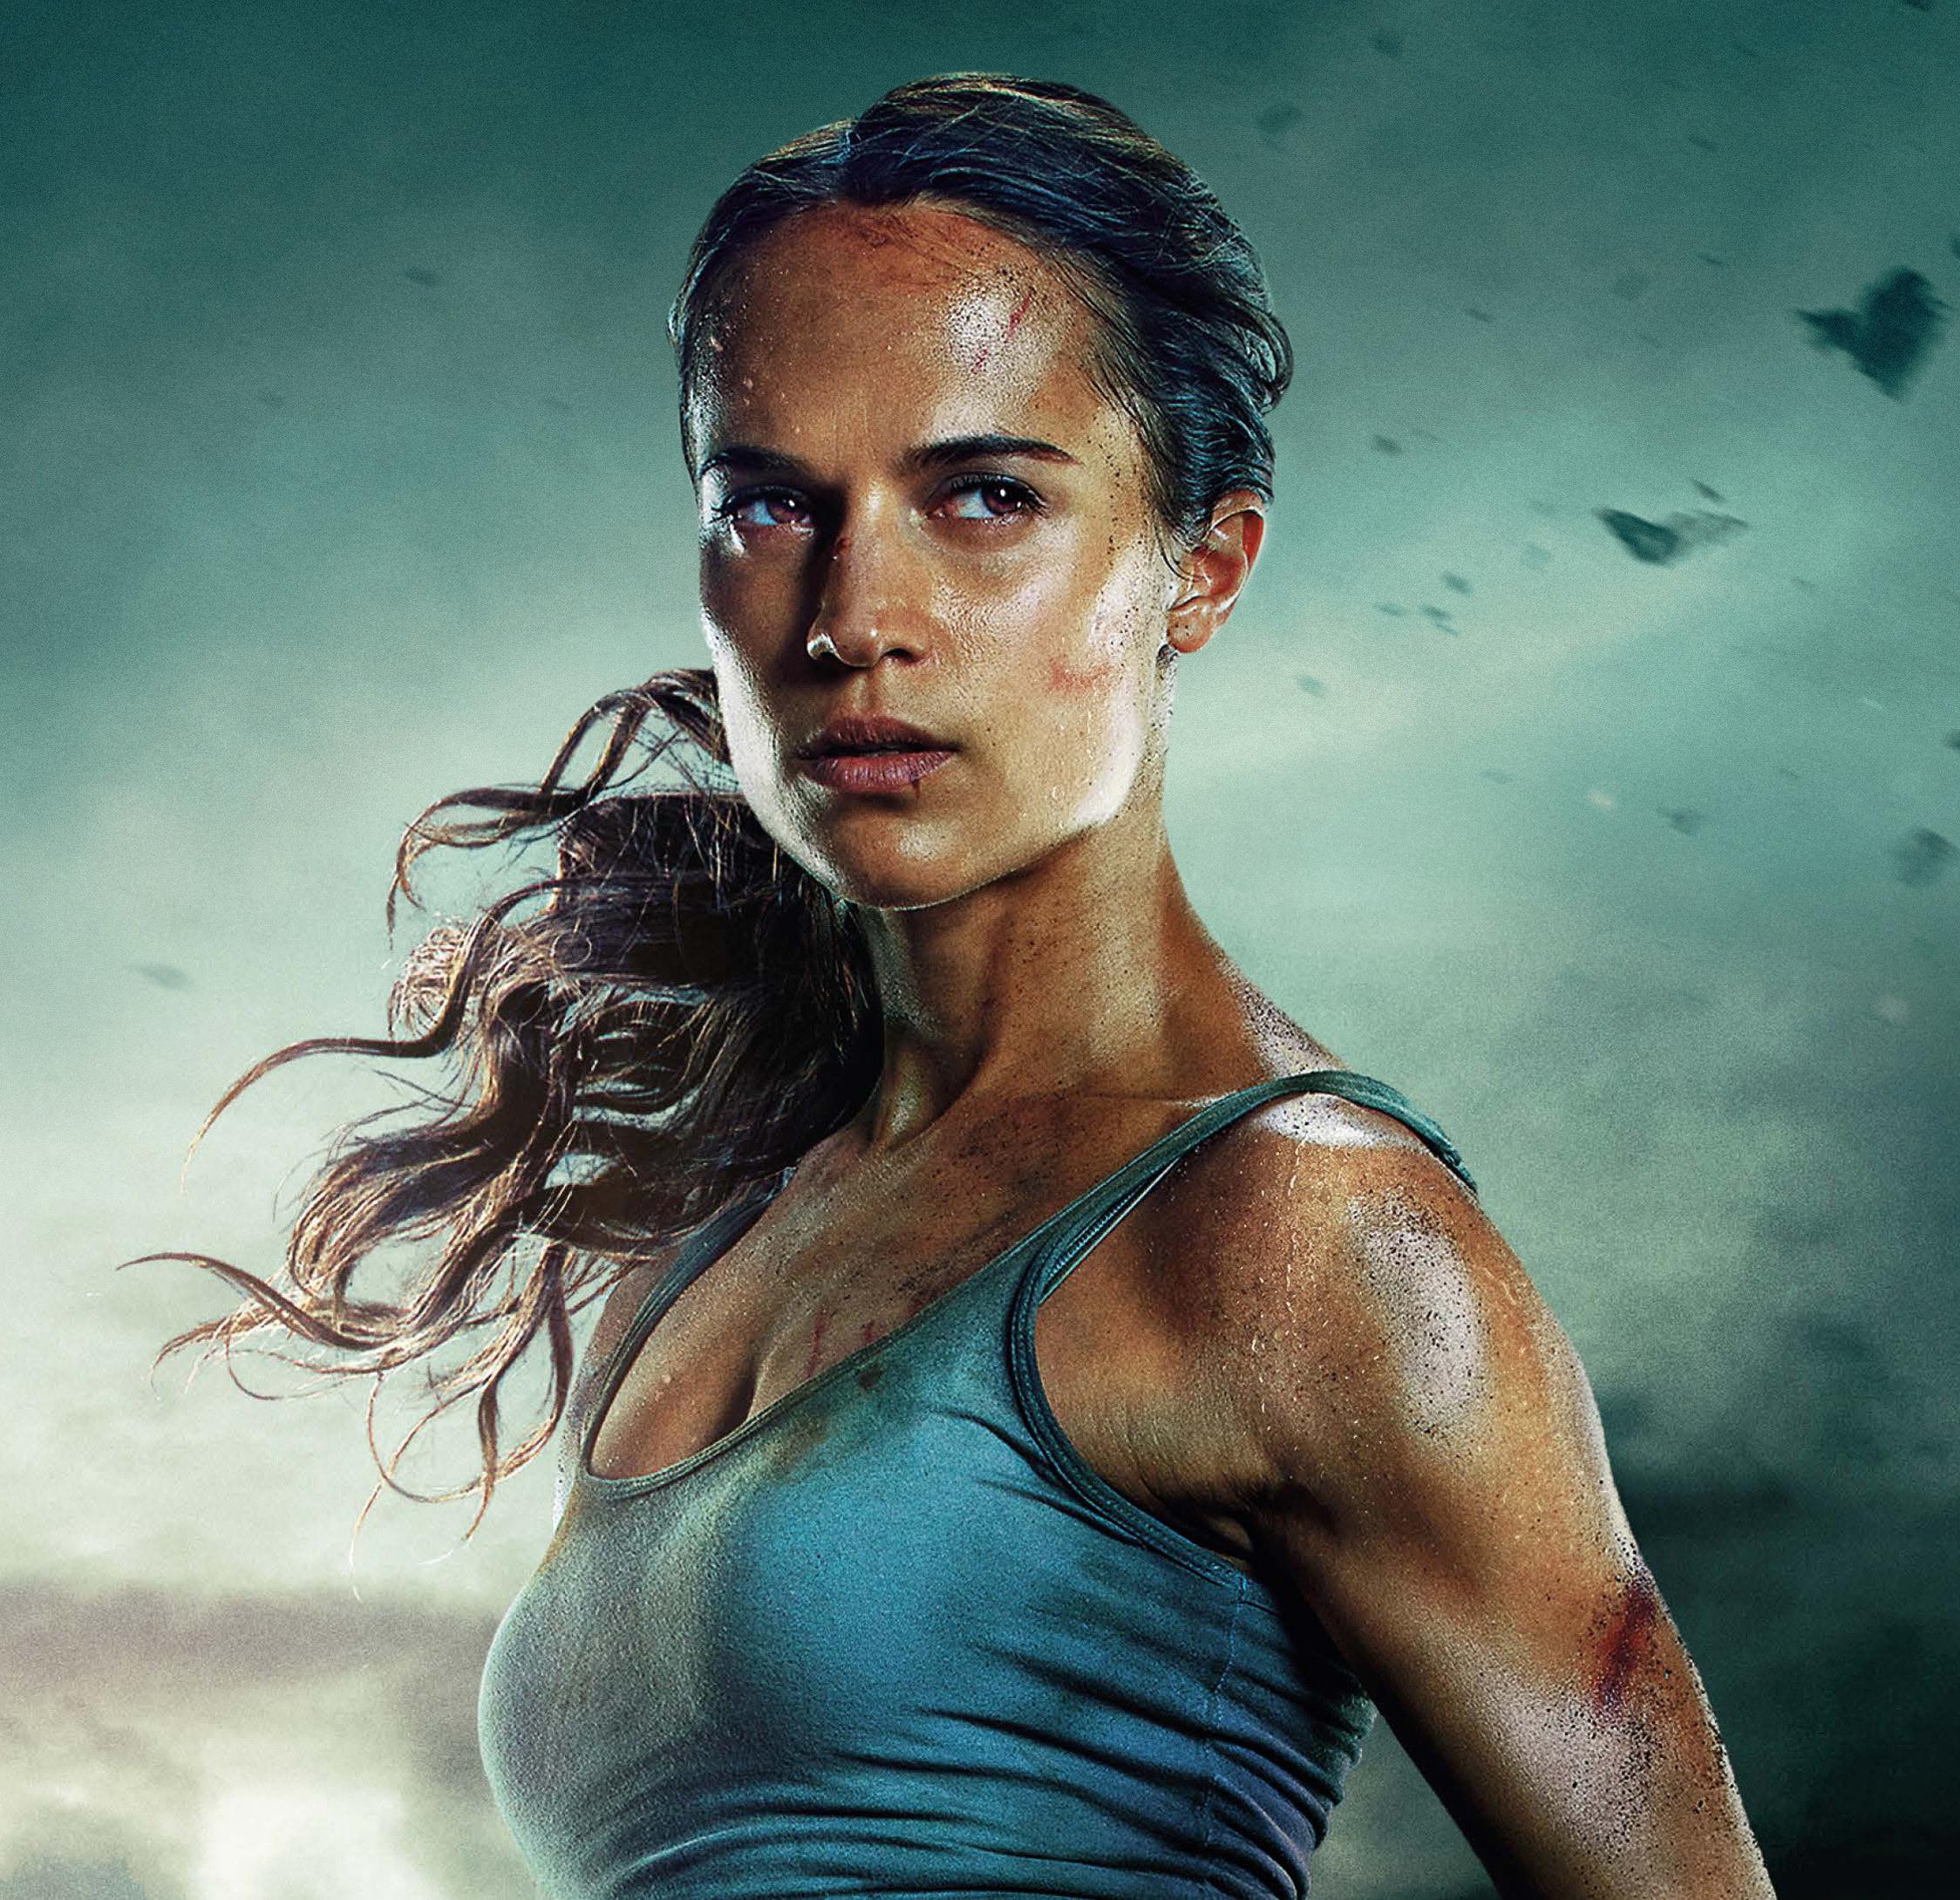 Wallpaper Tomb Raider 2018: Download 2248x2248 Wallpaper Alicia Vikander, Lara Croft